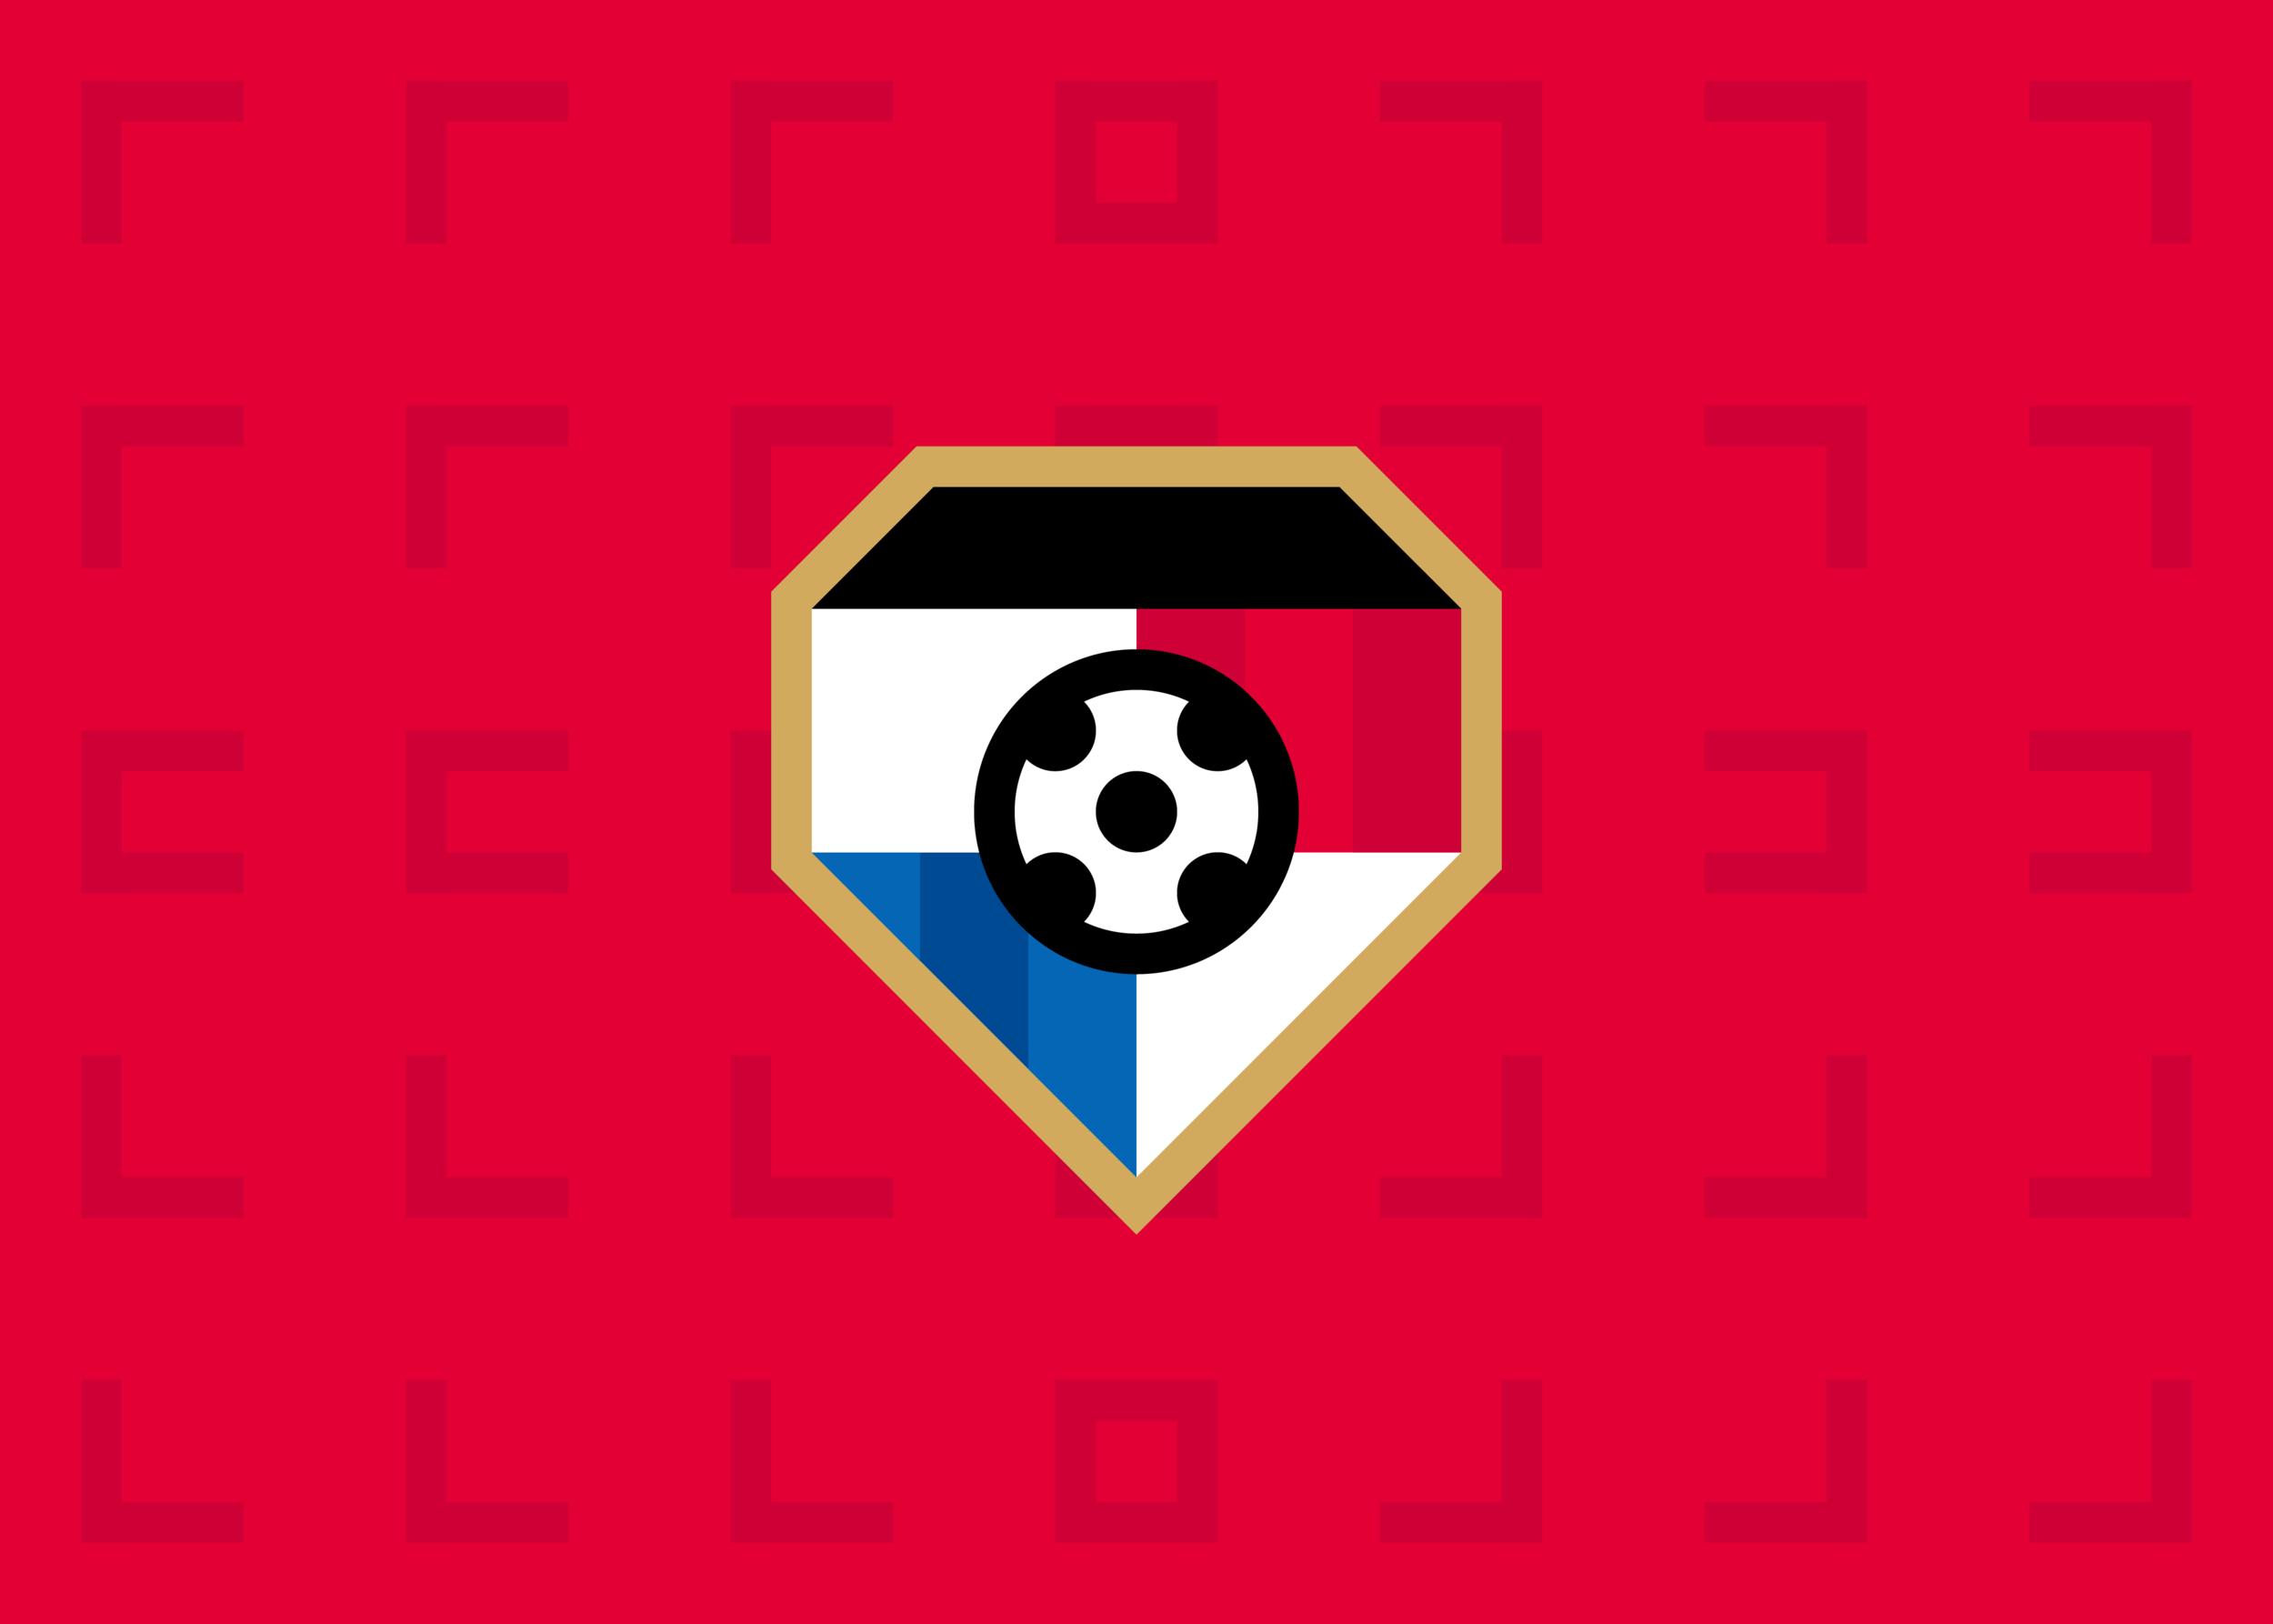 Panama-Geometric-World-Cup-Football-Badge-01-Logo-Design-Freelance-Kent.png